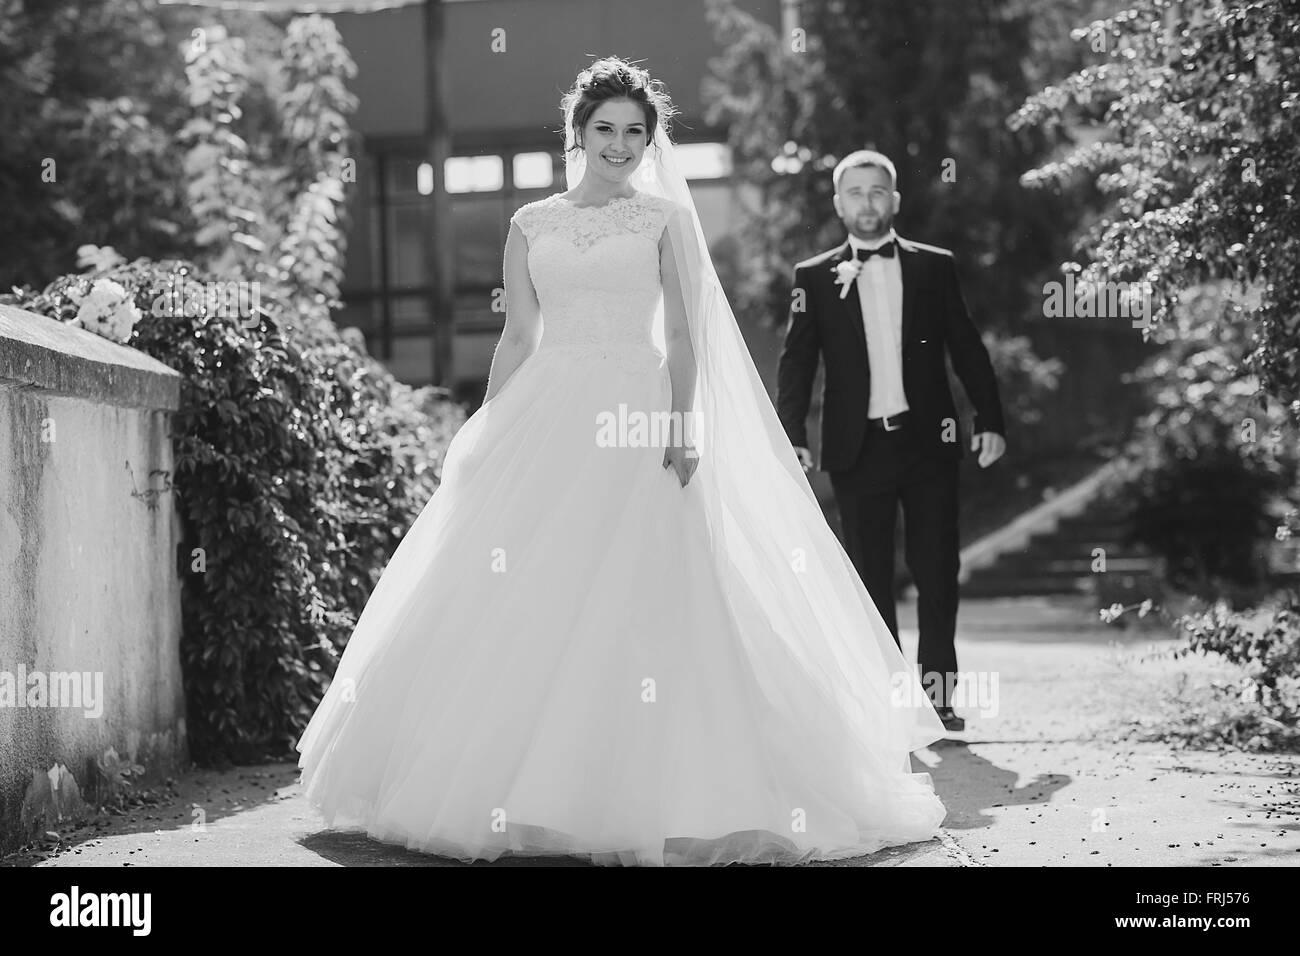 wedding day HD - Stock Image